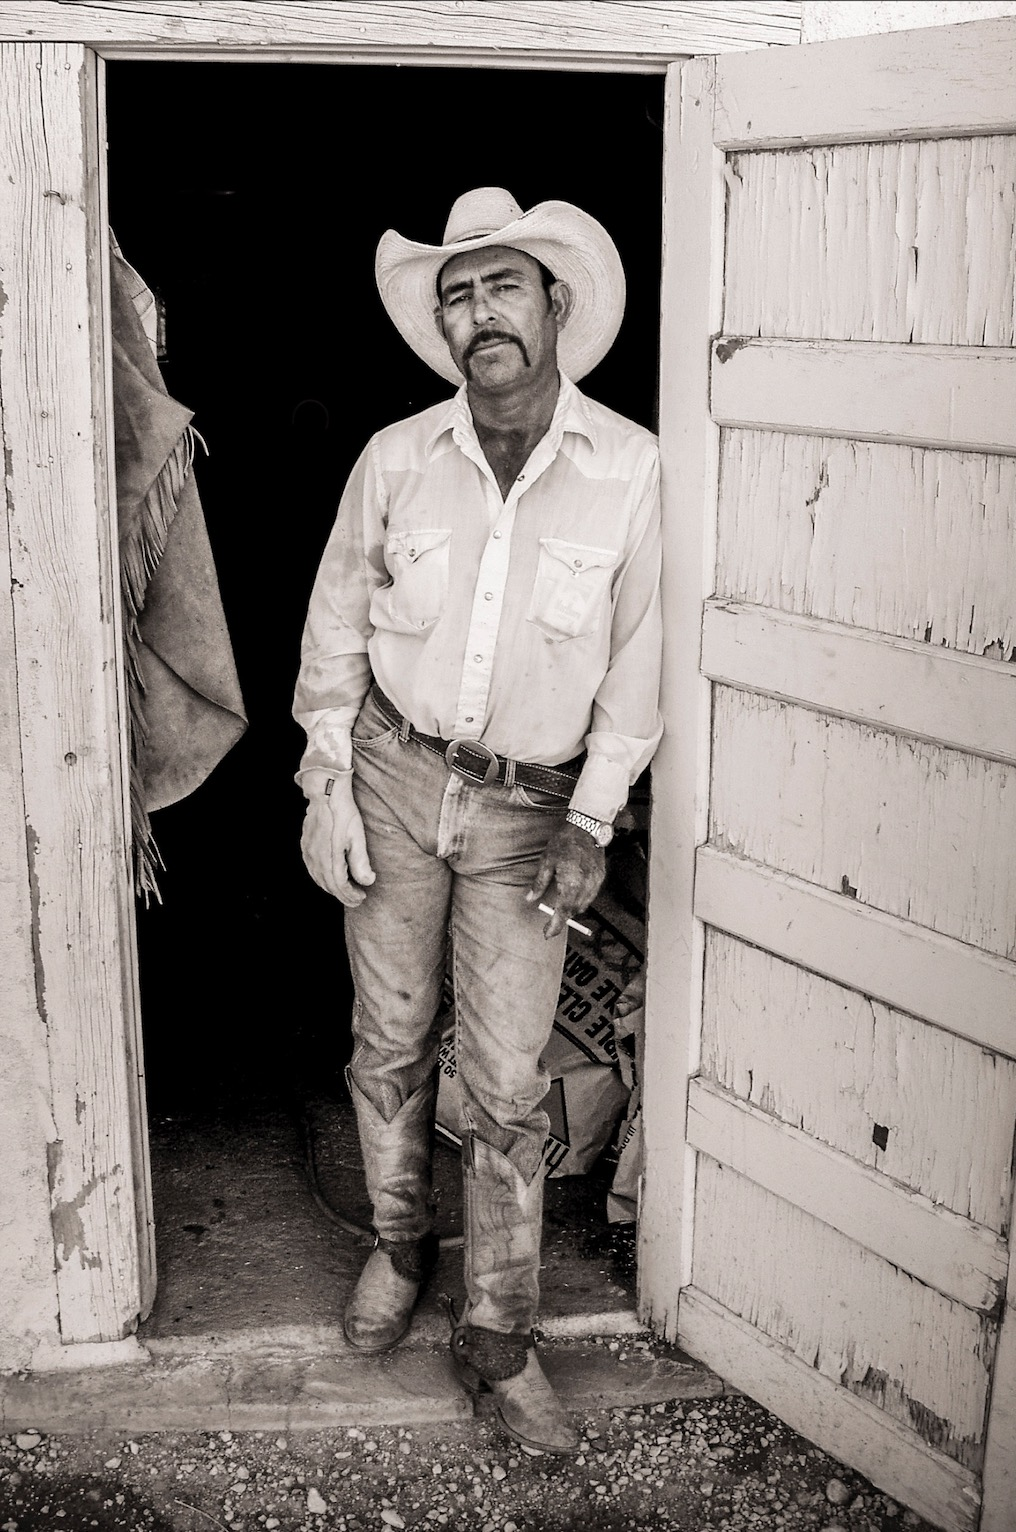 The Three Burials of Melquiades Estrada_Pepe ranch hand.jpg